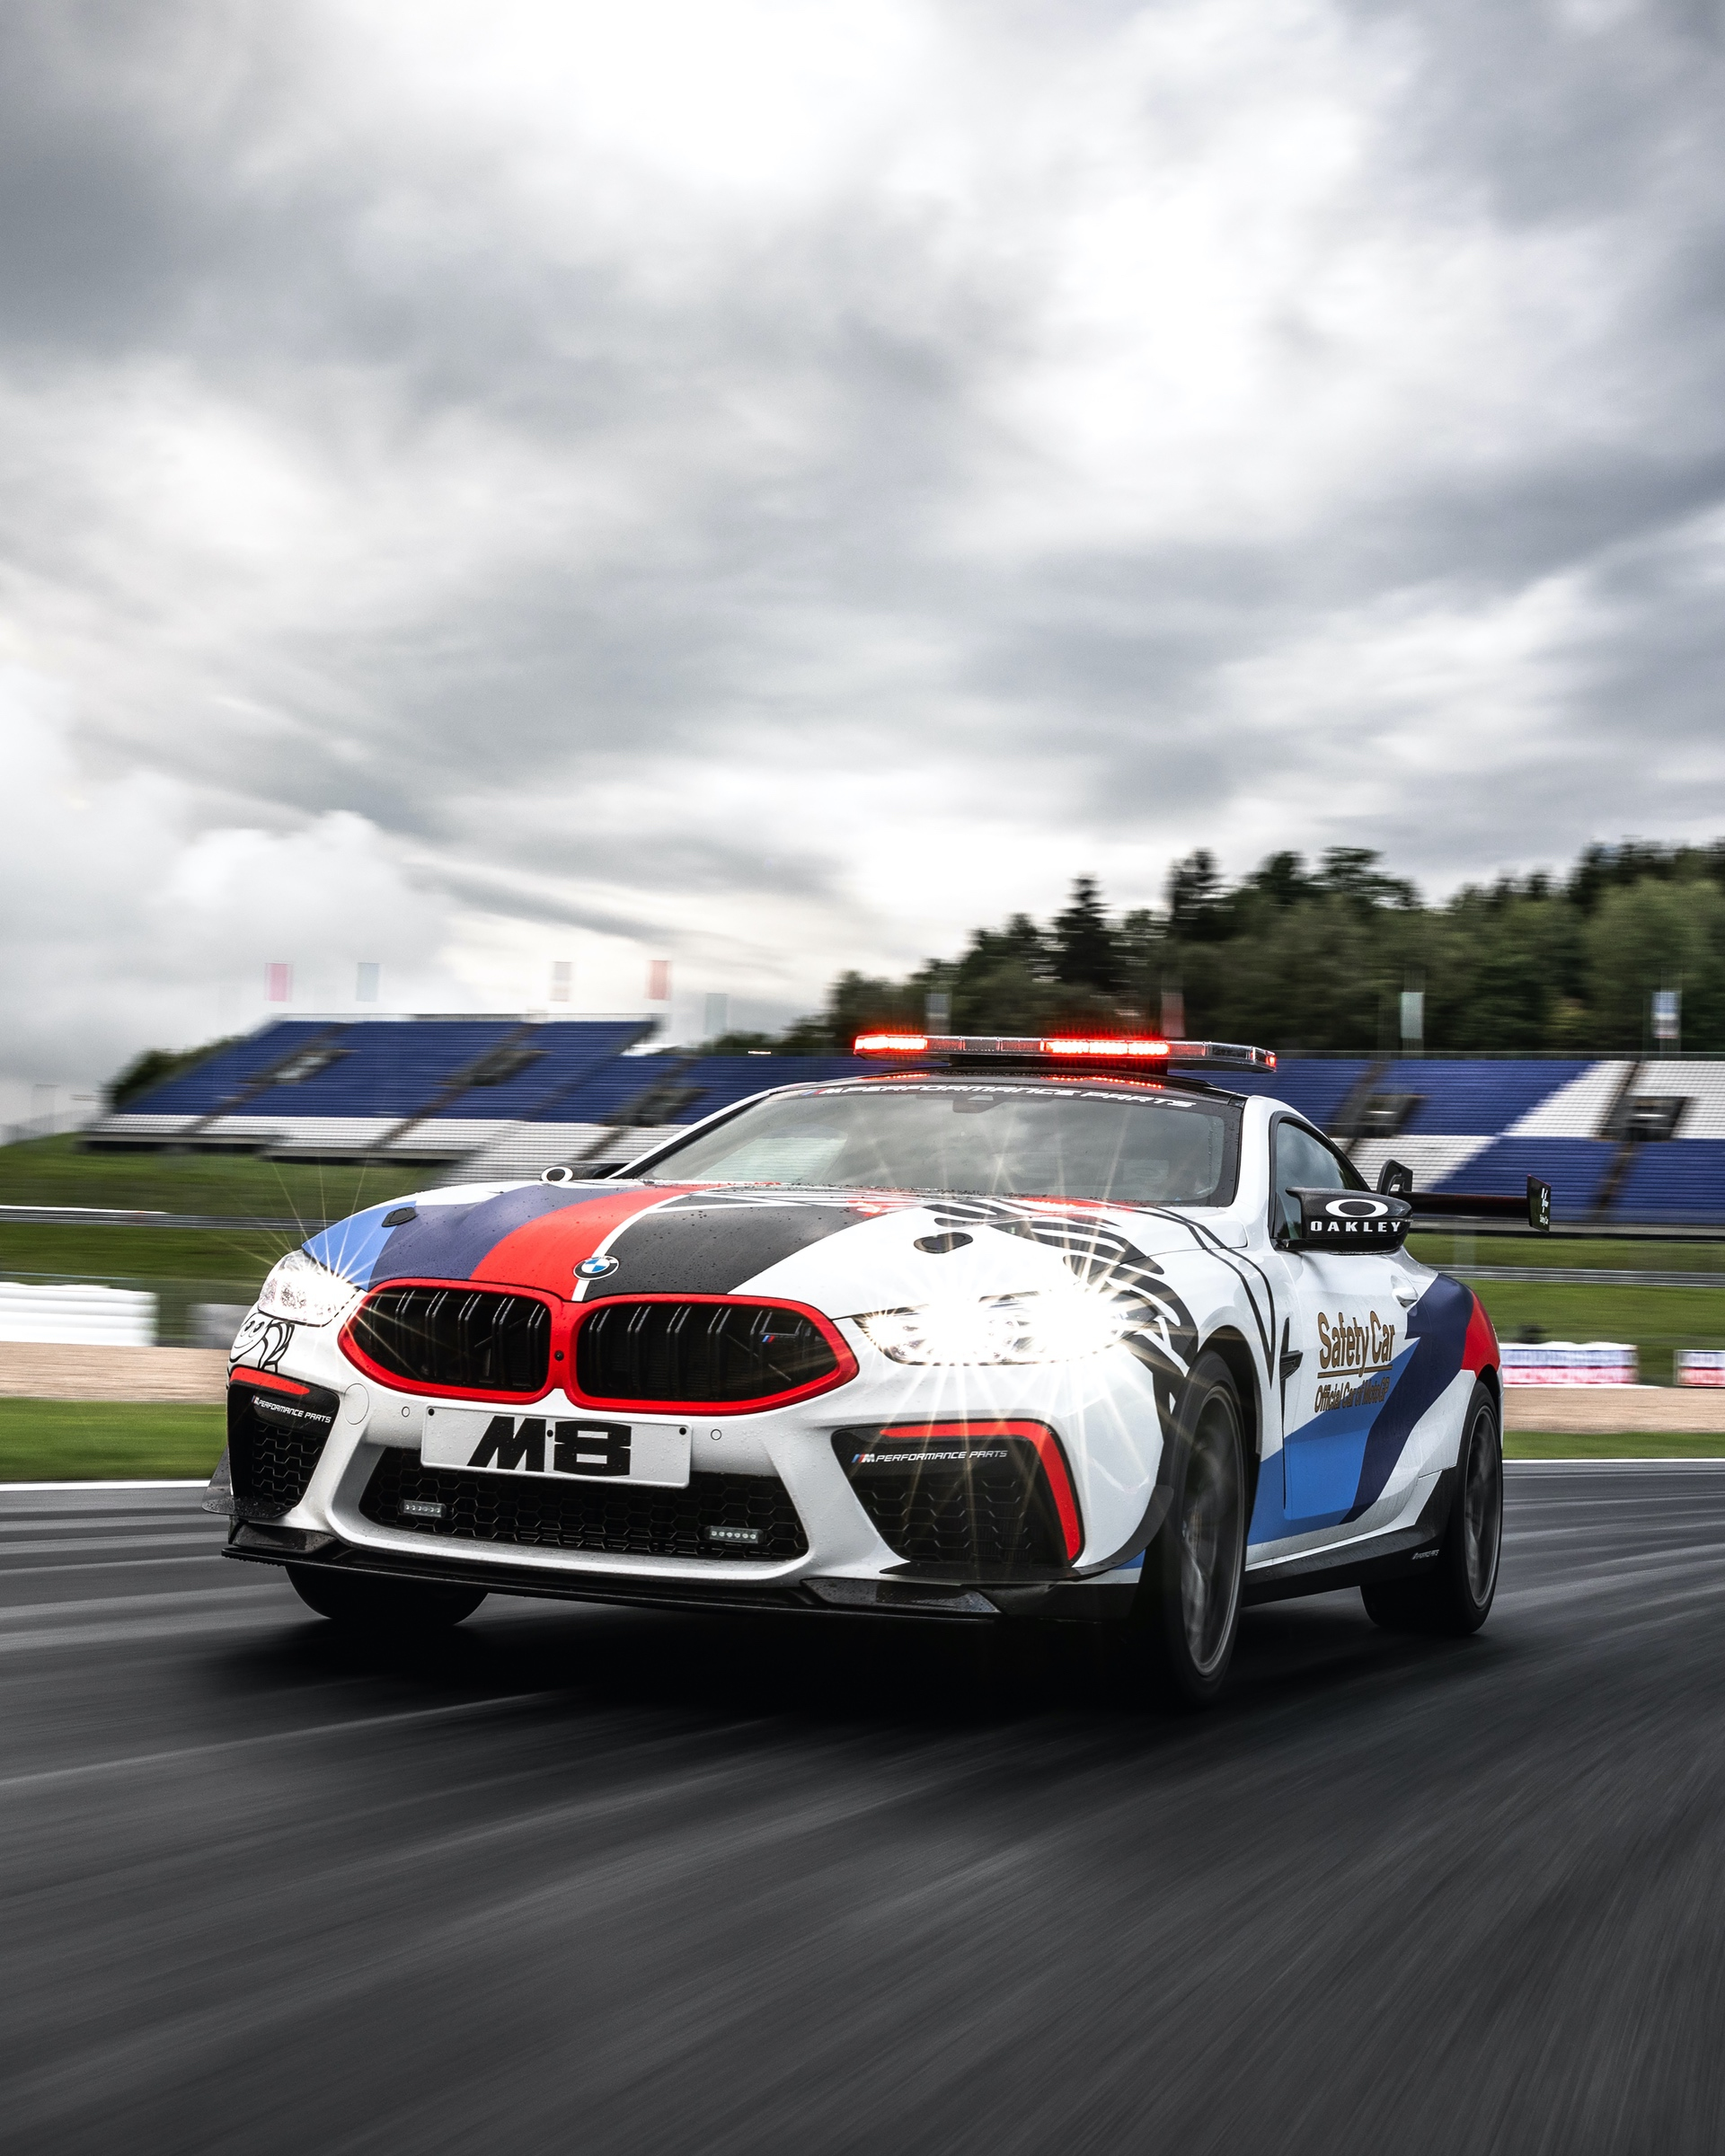 BMW_M8_MotoGP_Safety_Car_0015